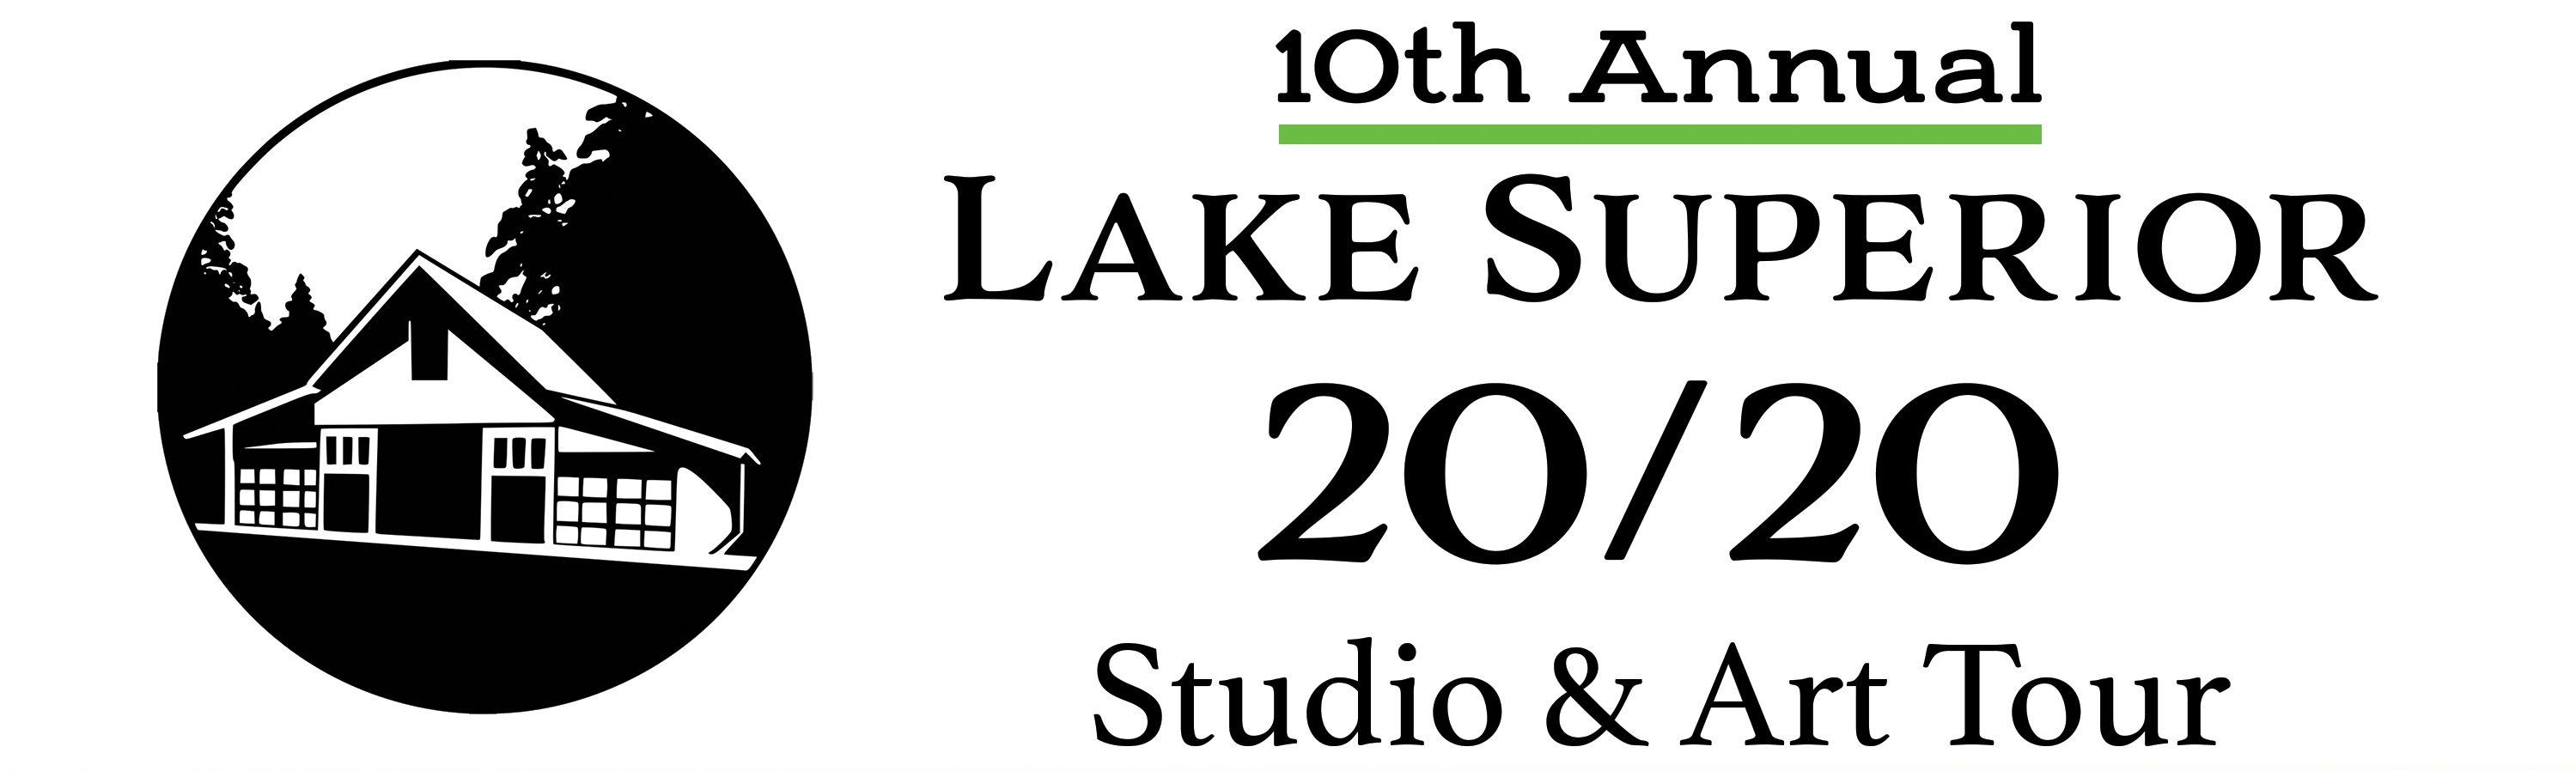 Lake Superior 20/20 Studio & Art Tour